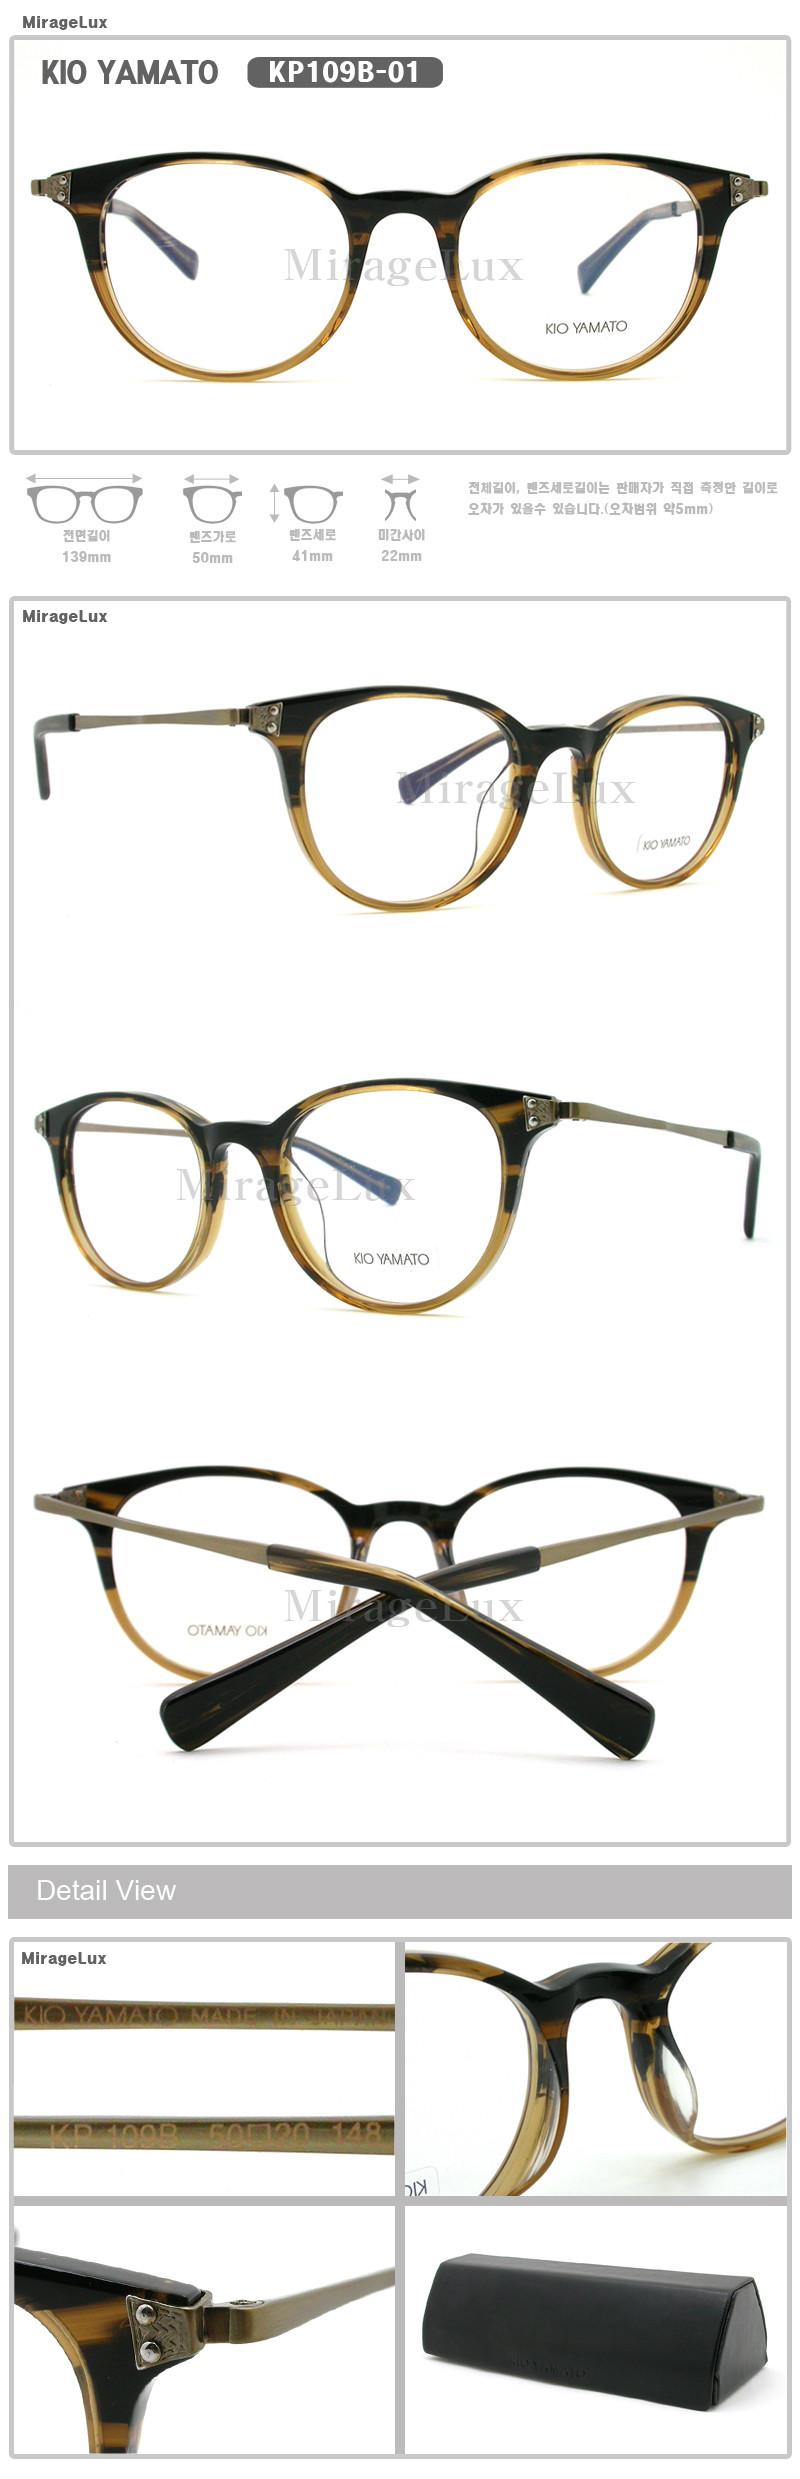 KIO YAMATO KP109B-01,02,03,04   Other Brand     Favorite eyeglasses ...